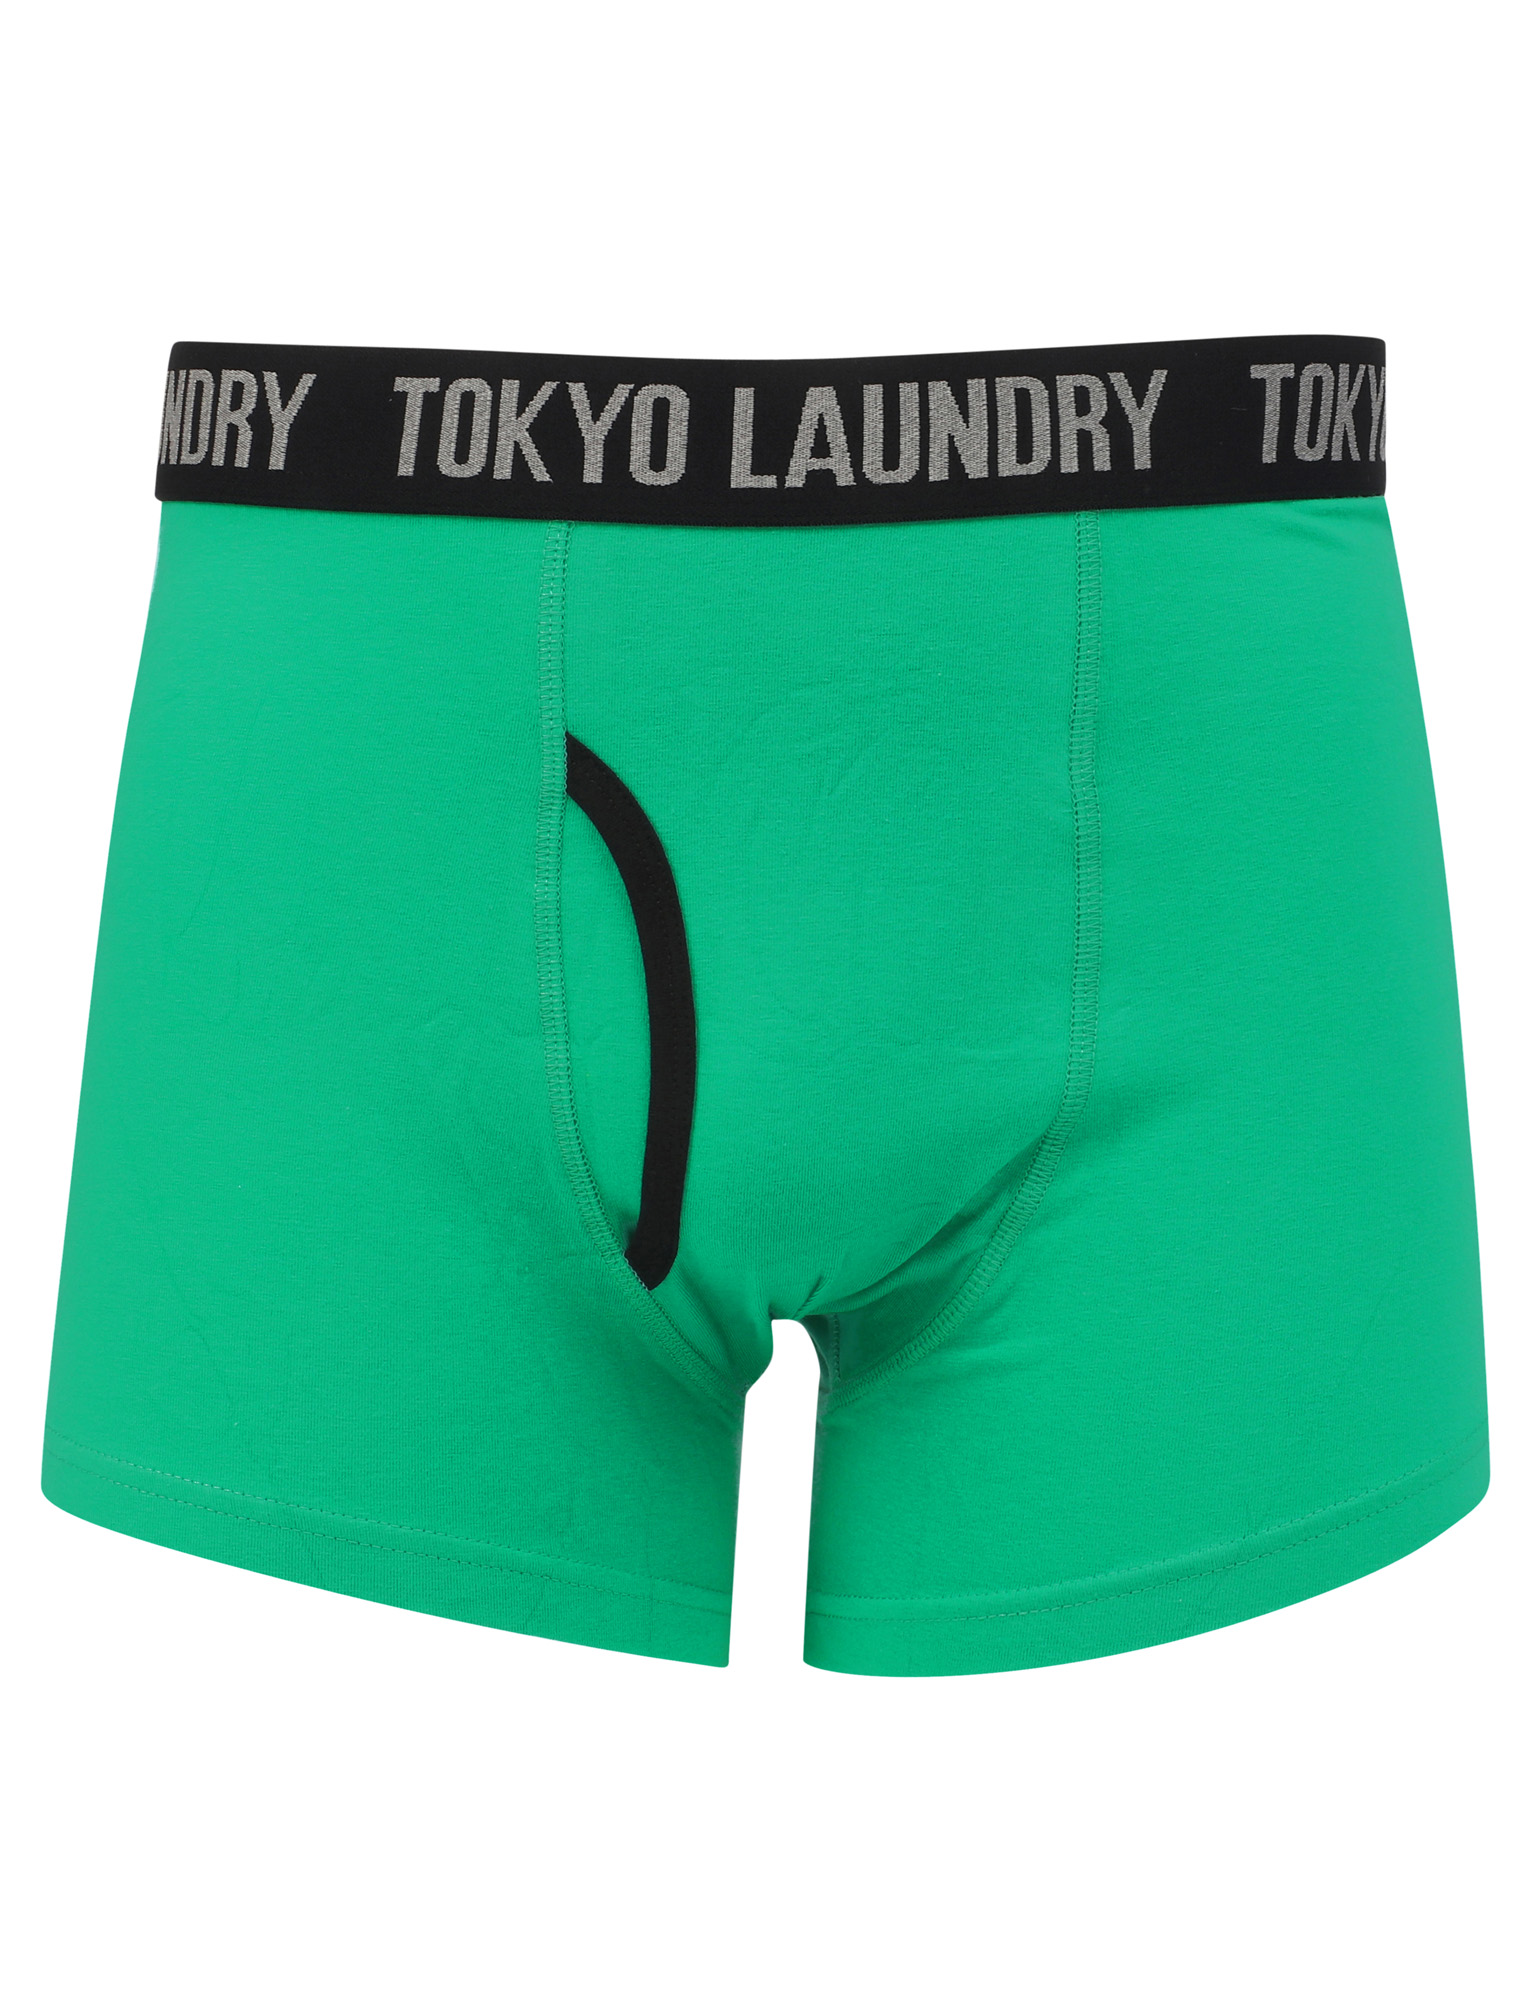 New-Mens-Tokyo-Laundry-2-Pack-Cotton-Rich-Boxer-Shorts-Set-Trunks-Size-S-XXL thumbnail 10